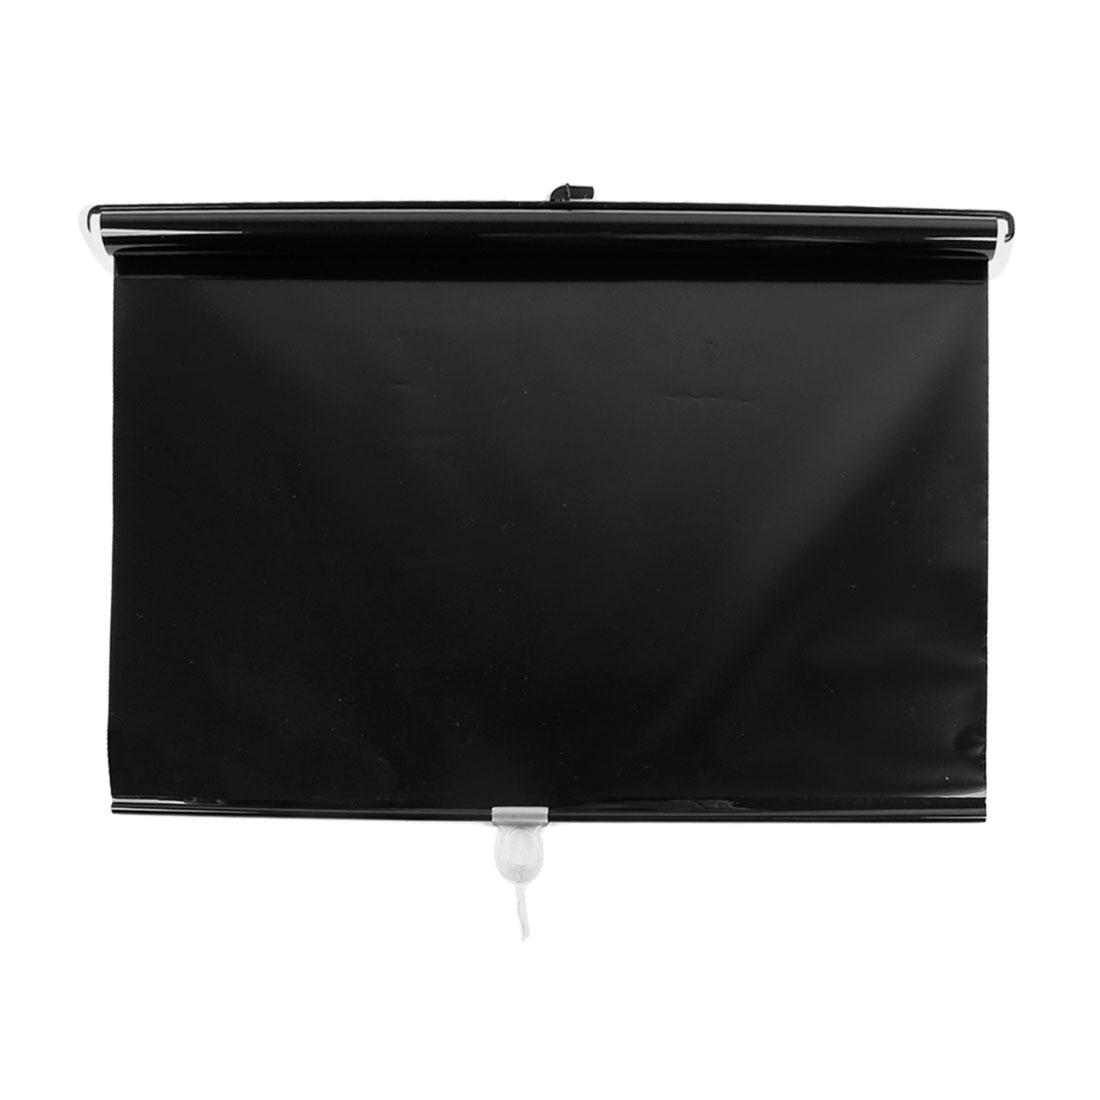 "49.6"" x 19.6"" Vinly Sun Visor Windcreen Window Sunshade Black for Car"